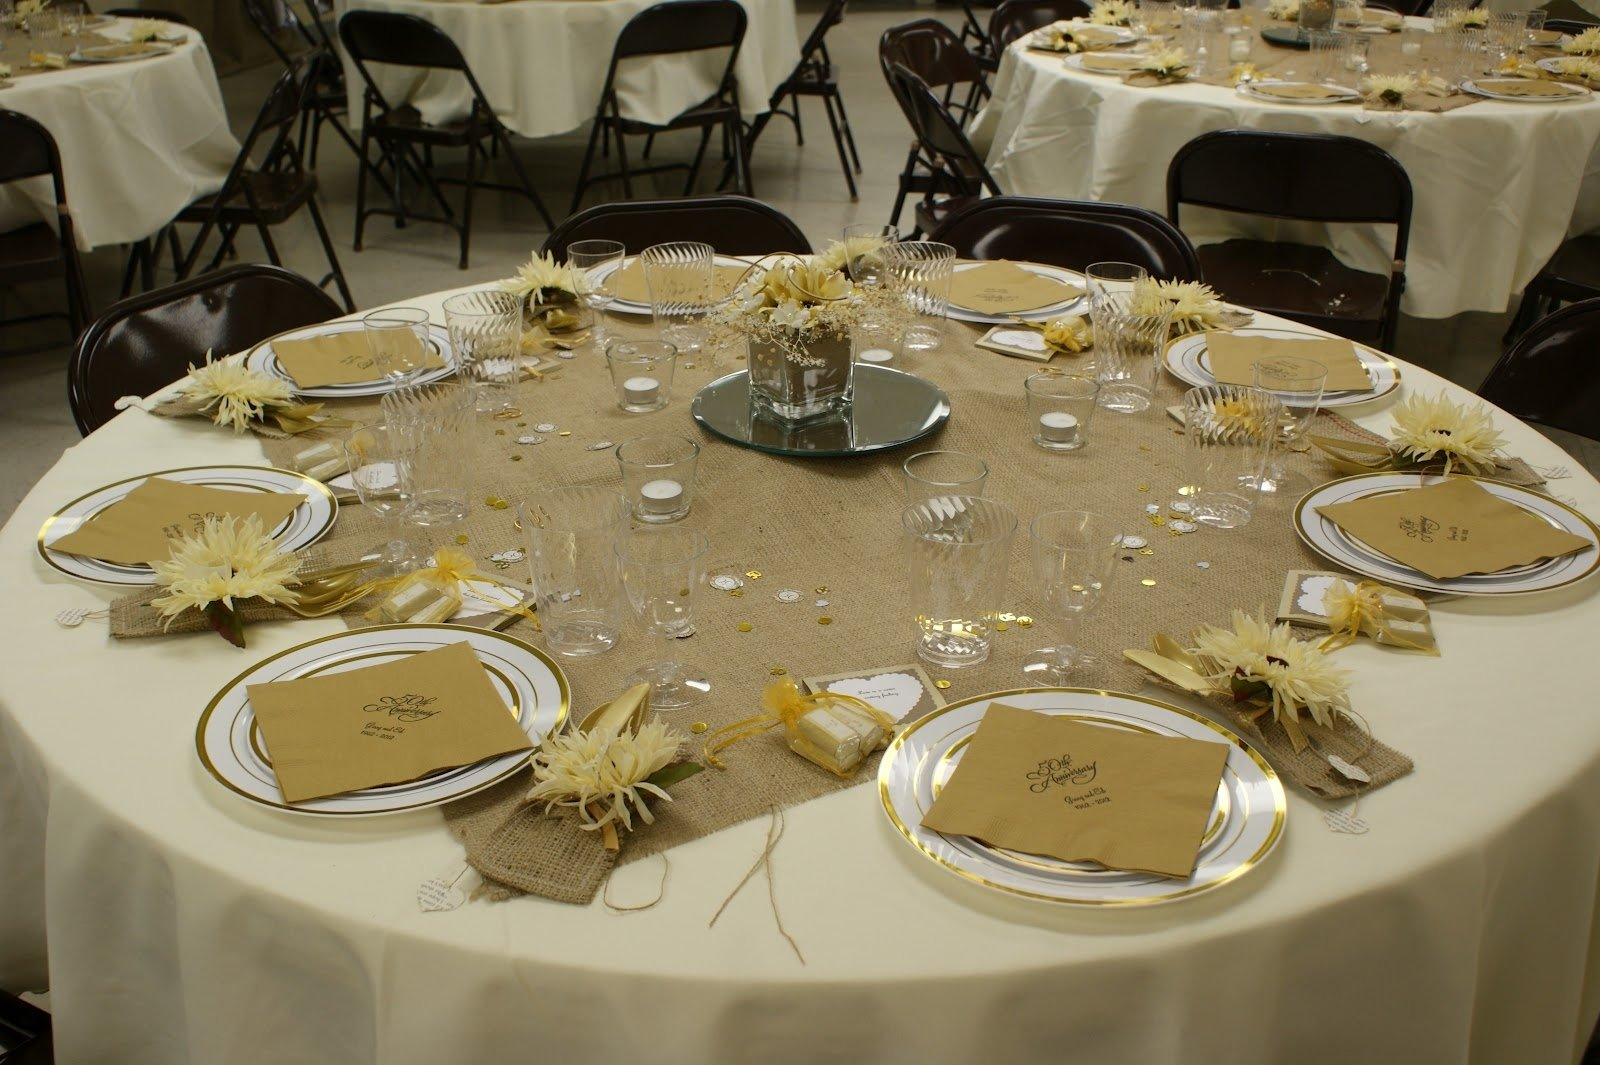 10 Stunning 50 Wedding Anniversary Party Ideas 50th wedding anniversary party ideas food 50th wedding anniversary 3 2021